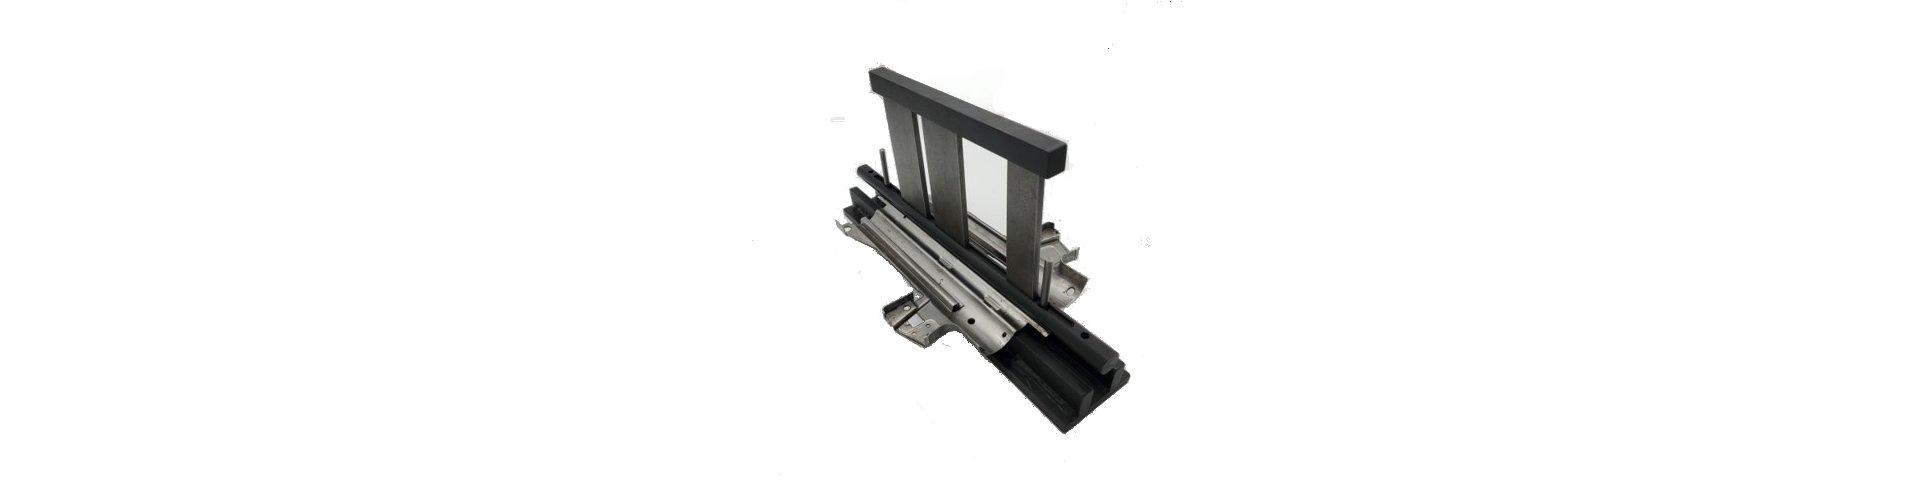 https://www.triple-r-products.com/catalog/firearm-accessories/tools